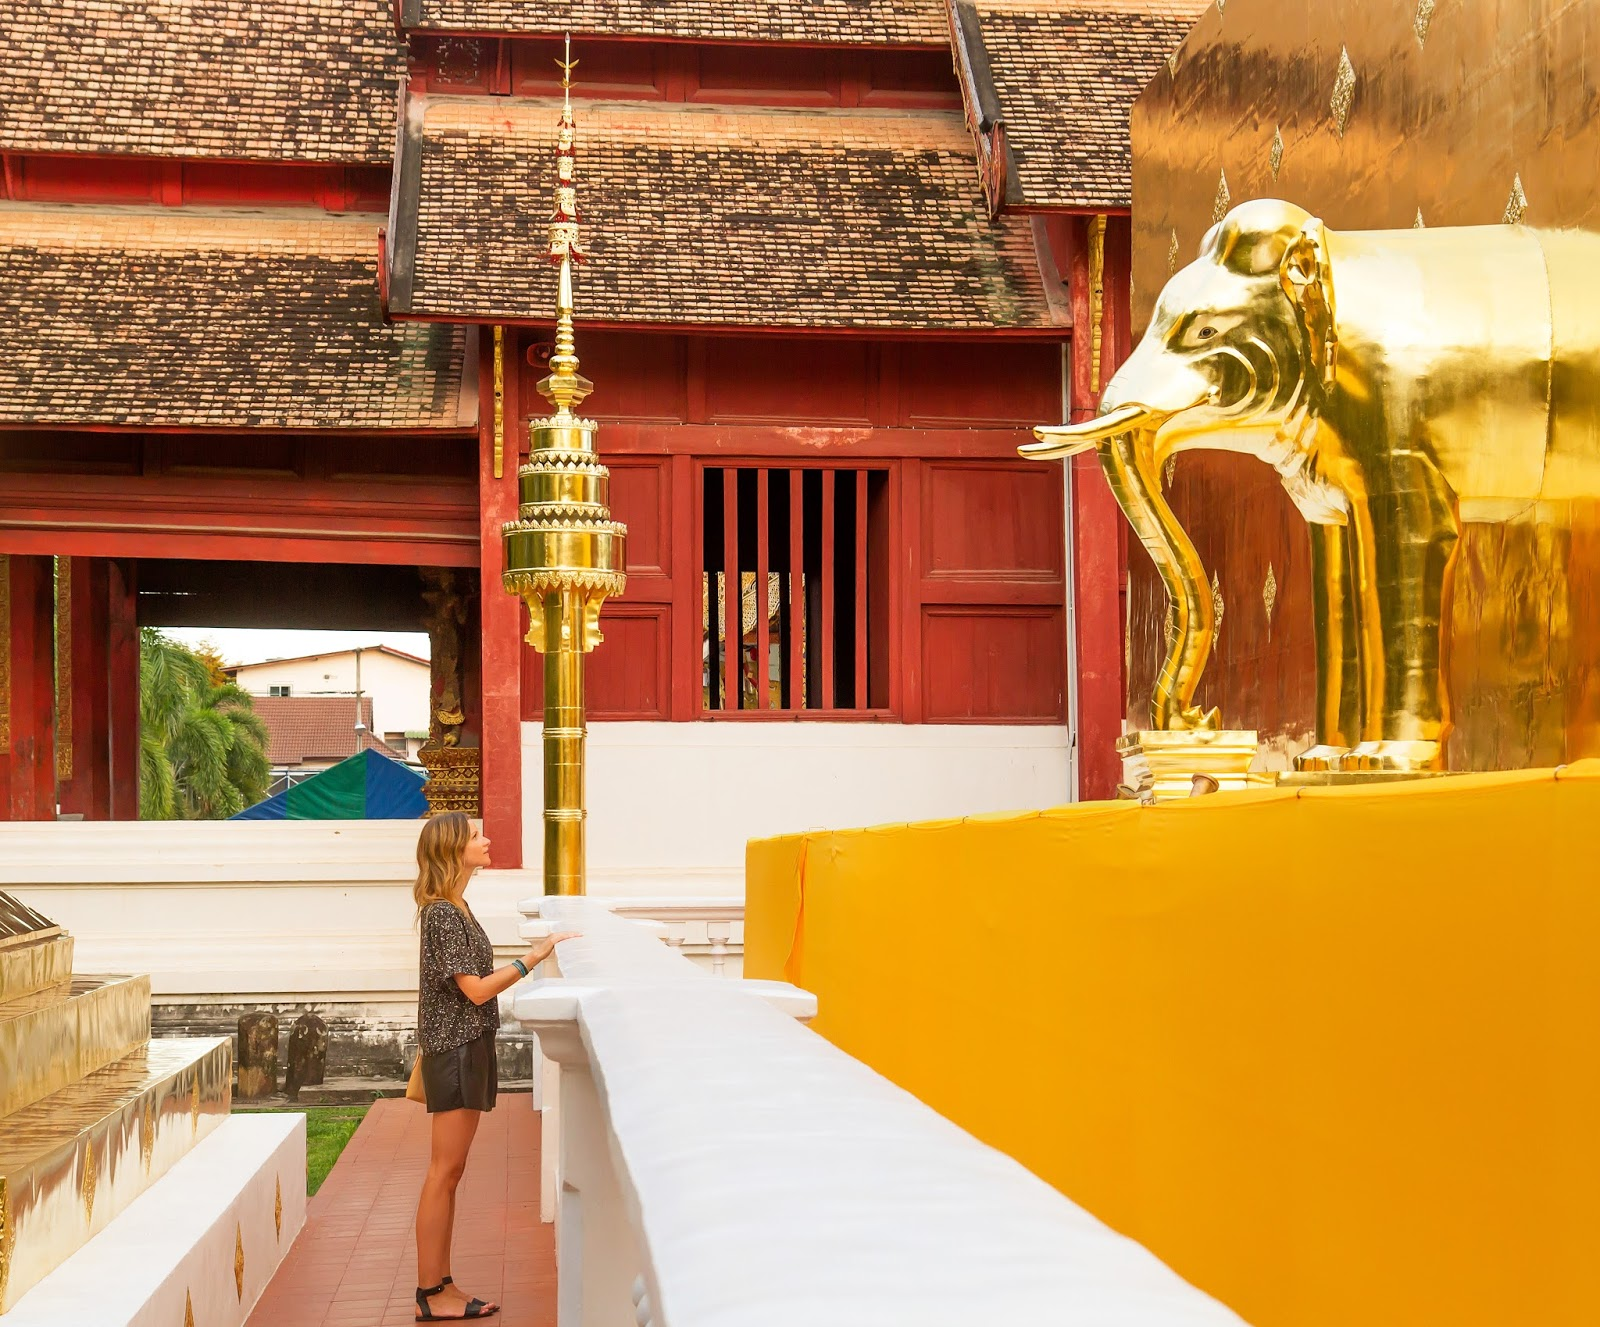 Wat Phra Singh Temple, Chiang Mai Thailand, Alison Hutchinson